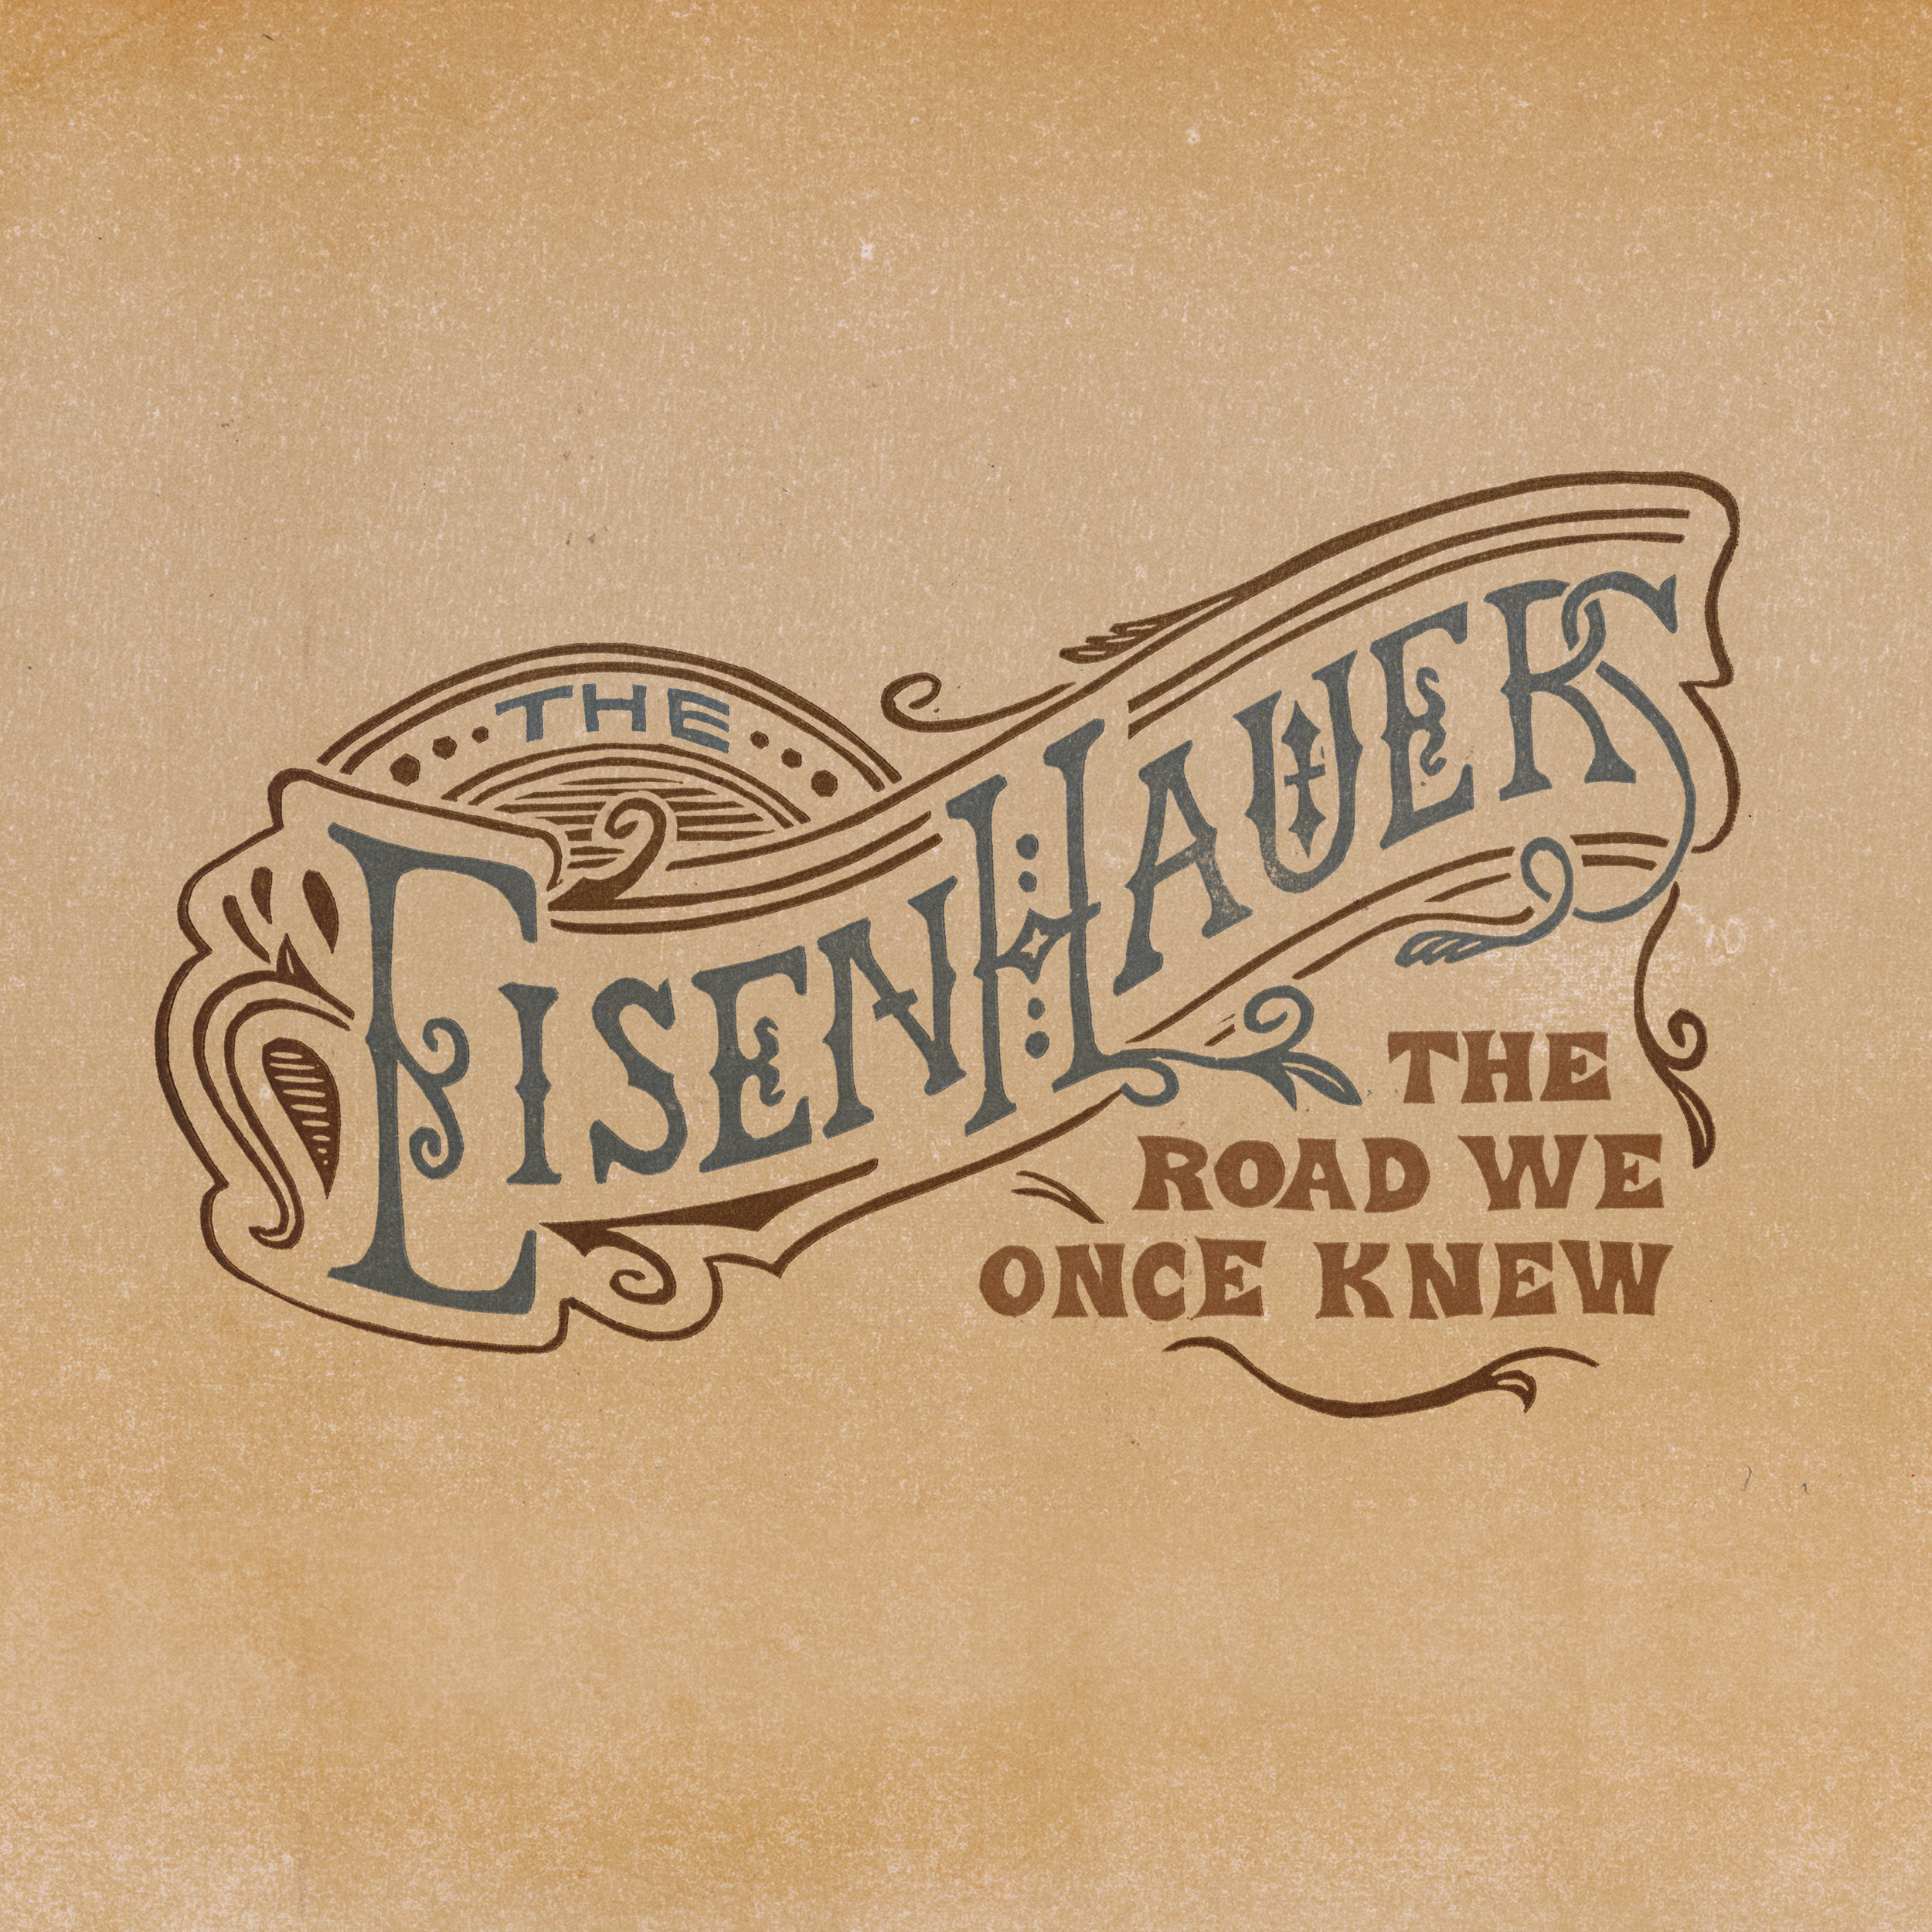 Eisenhauer-CD-Cover-FINAL.jpg